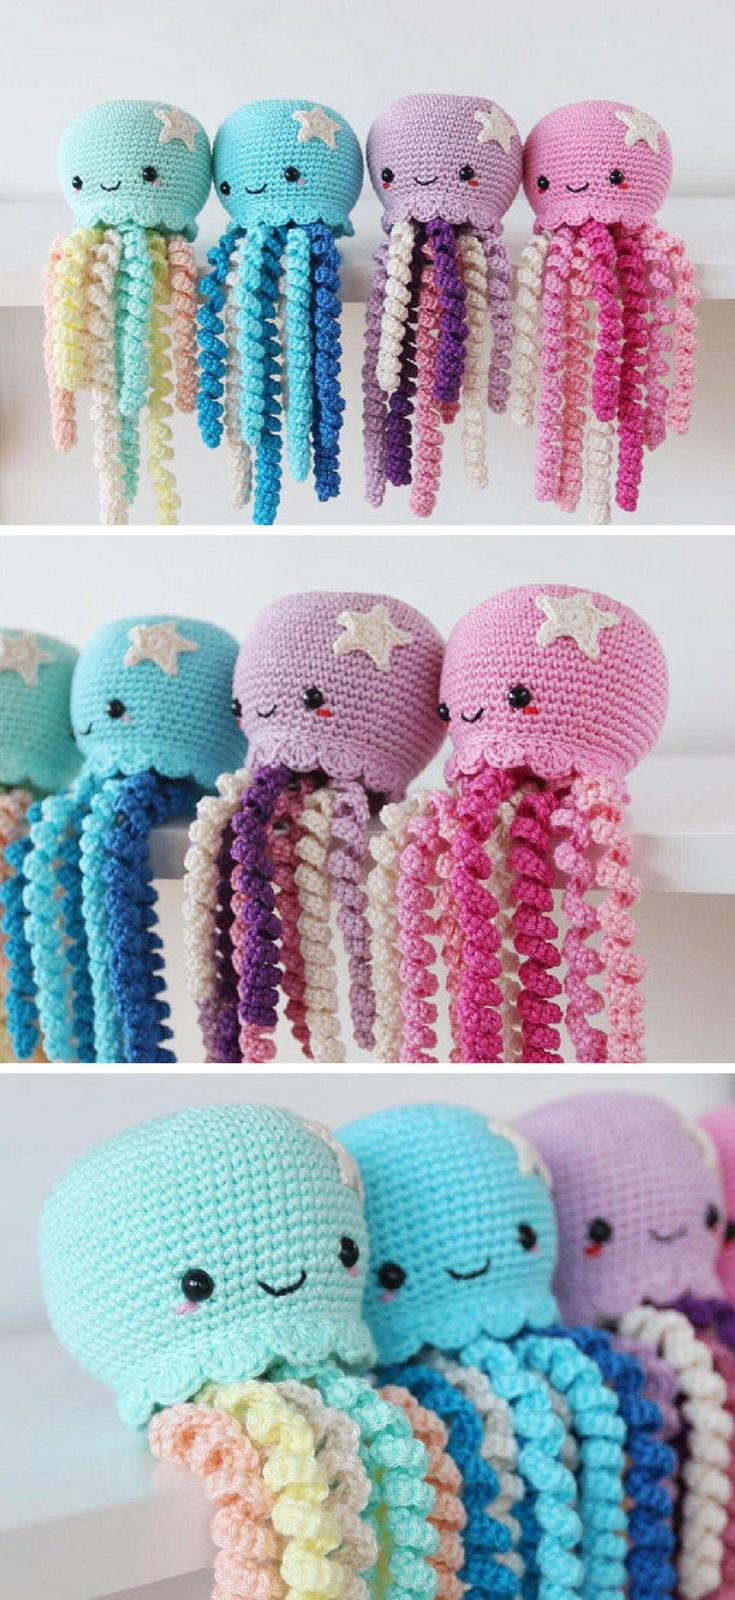 Amigurumi Octopus Crochet Pattern Printable PDF | Amigurumi ...